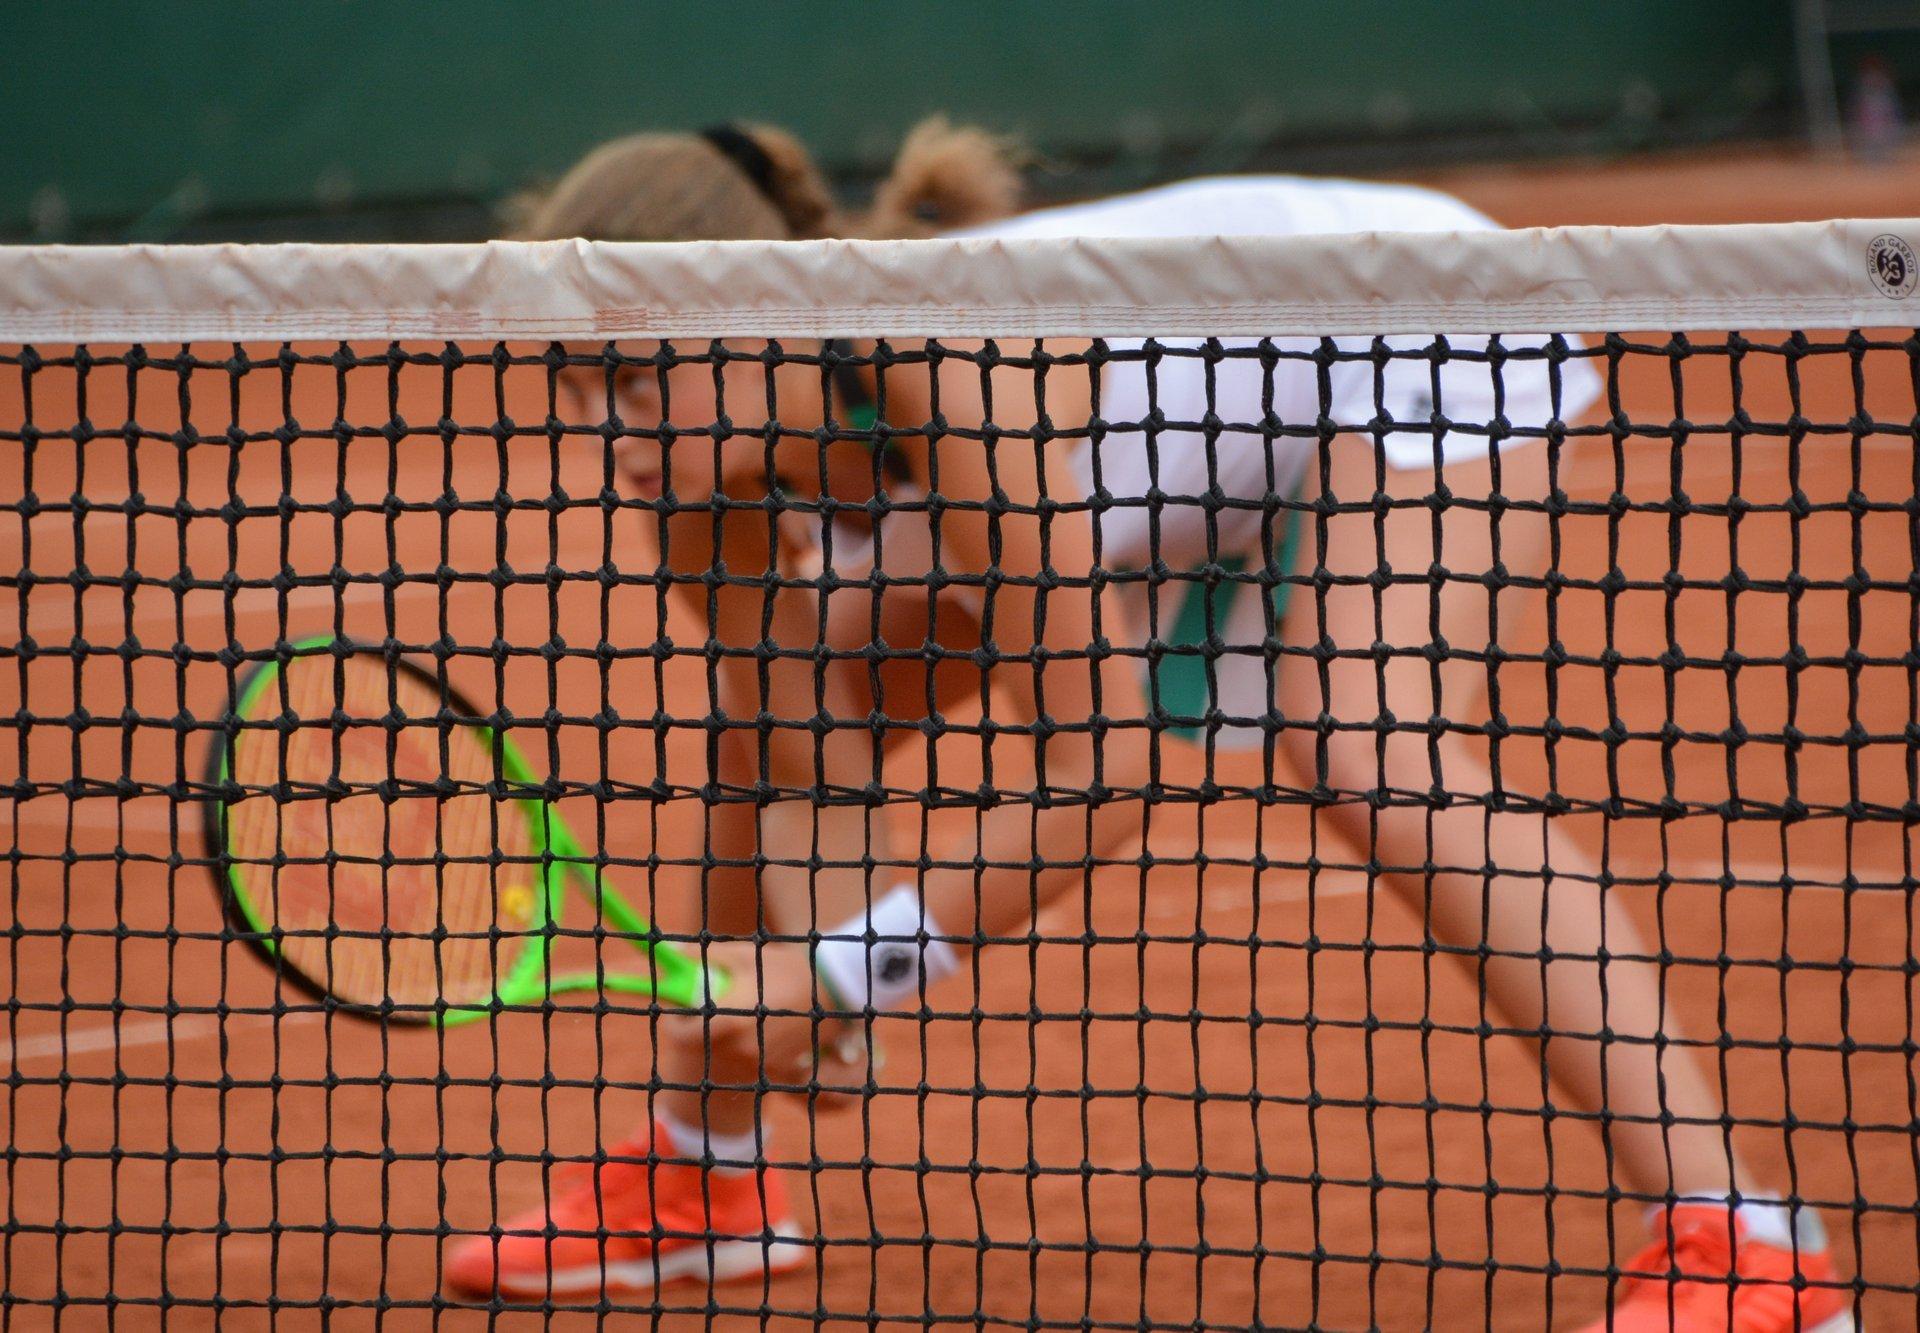 Jelena Ostapenko at Roland Garros 2017 2020